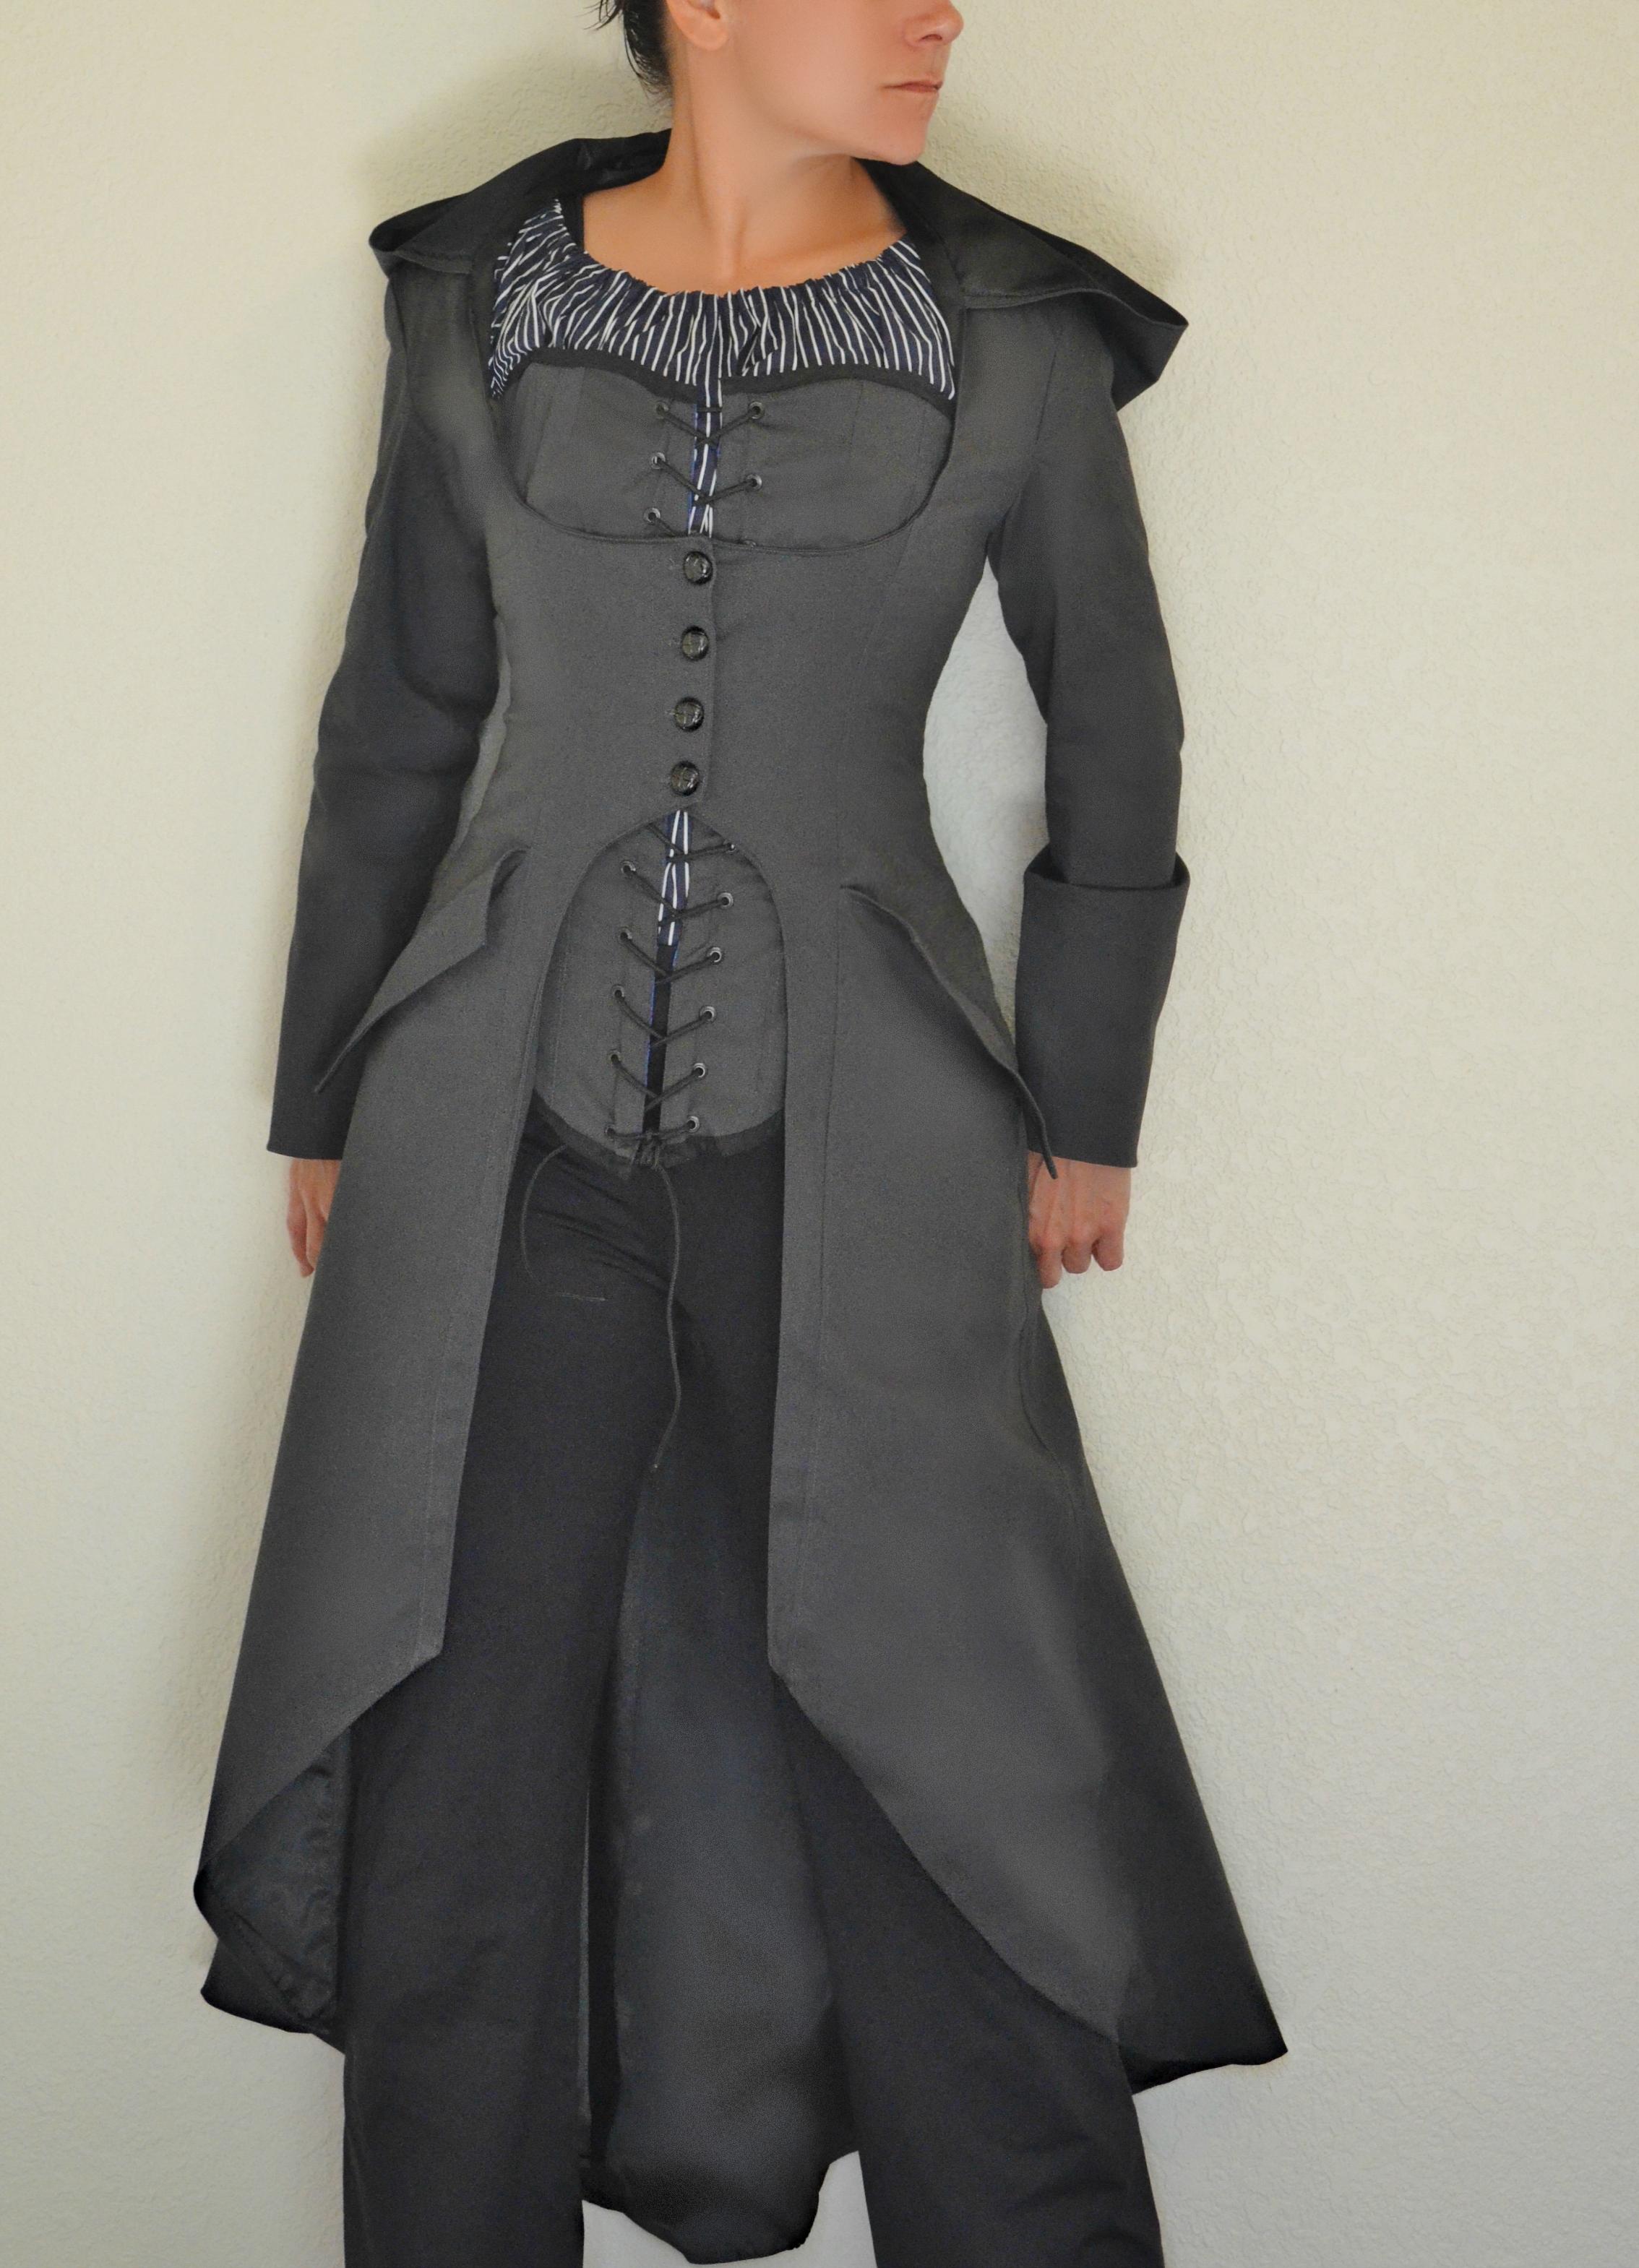 Dark gray hooded steampunk corset coat corset chemise blouse dark gray hooded steampunk corset coat corset chemise blouse sewing projects burdastyle jeuxipadfo Gallery